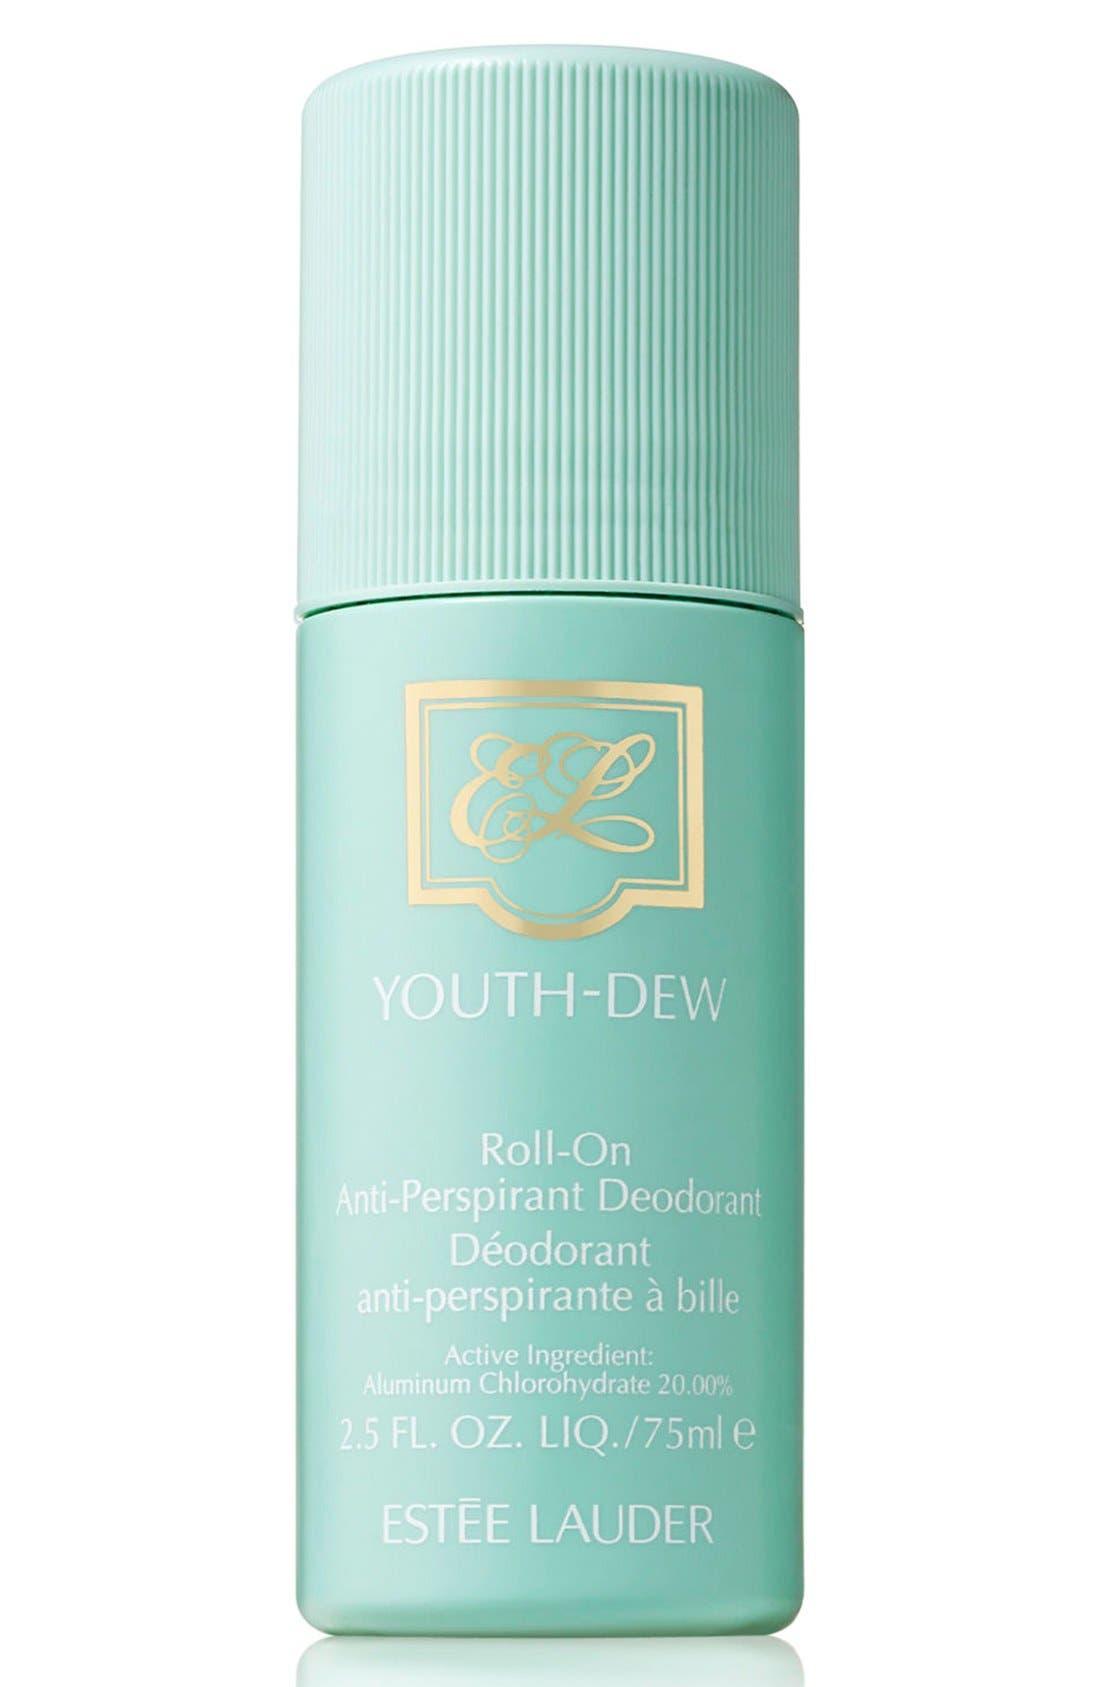 Darphin deodorant